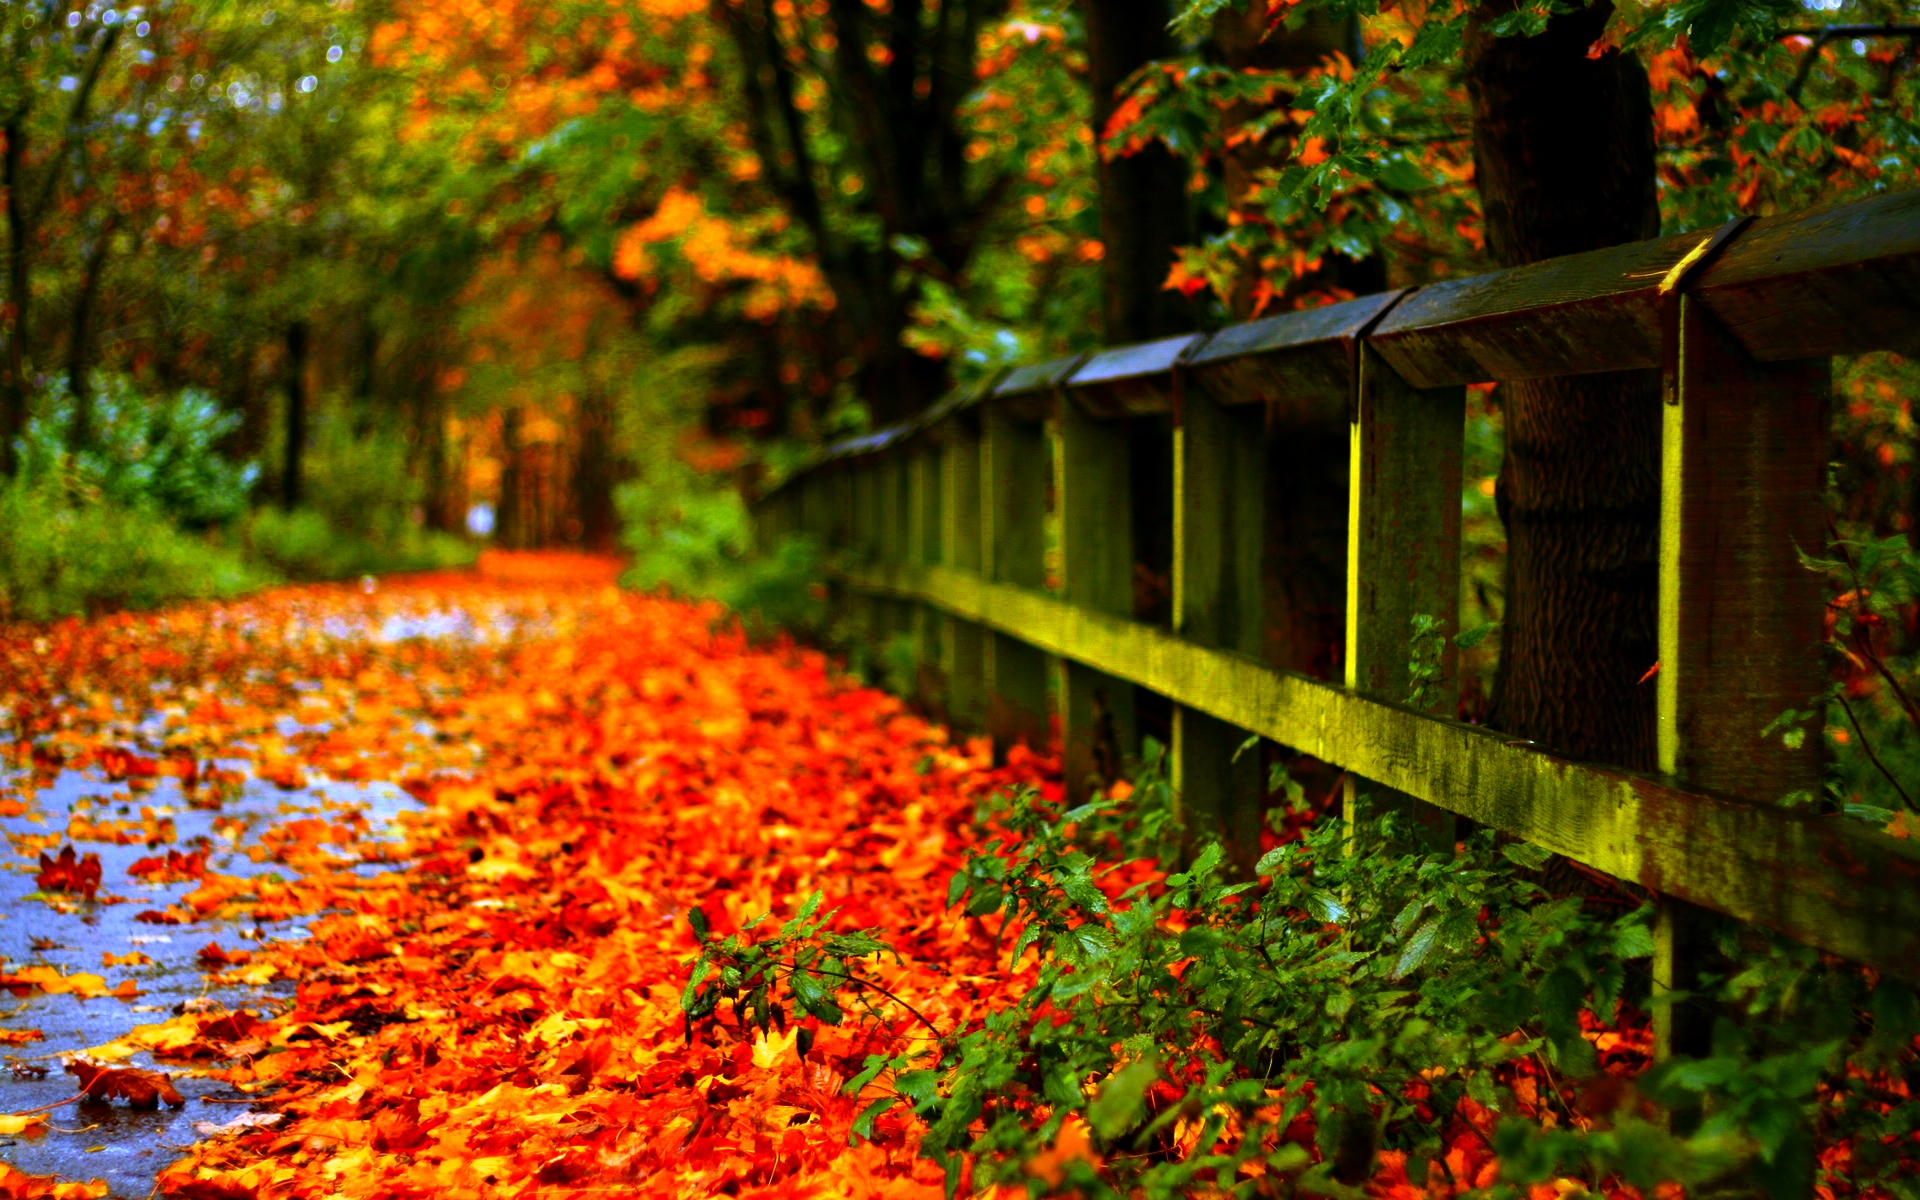 Autumn Leaf 1920x1200